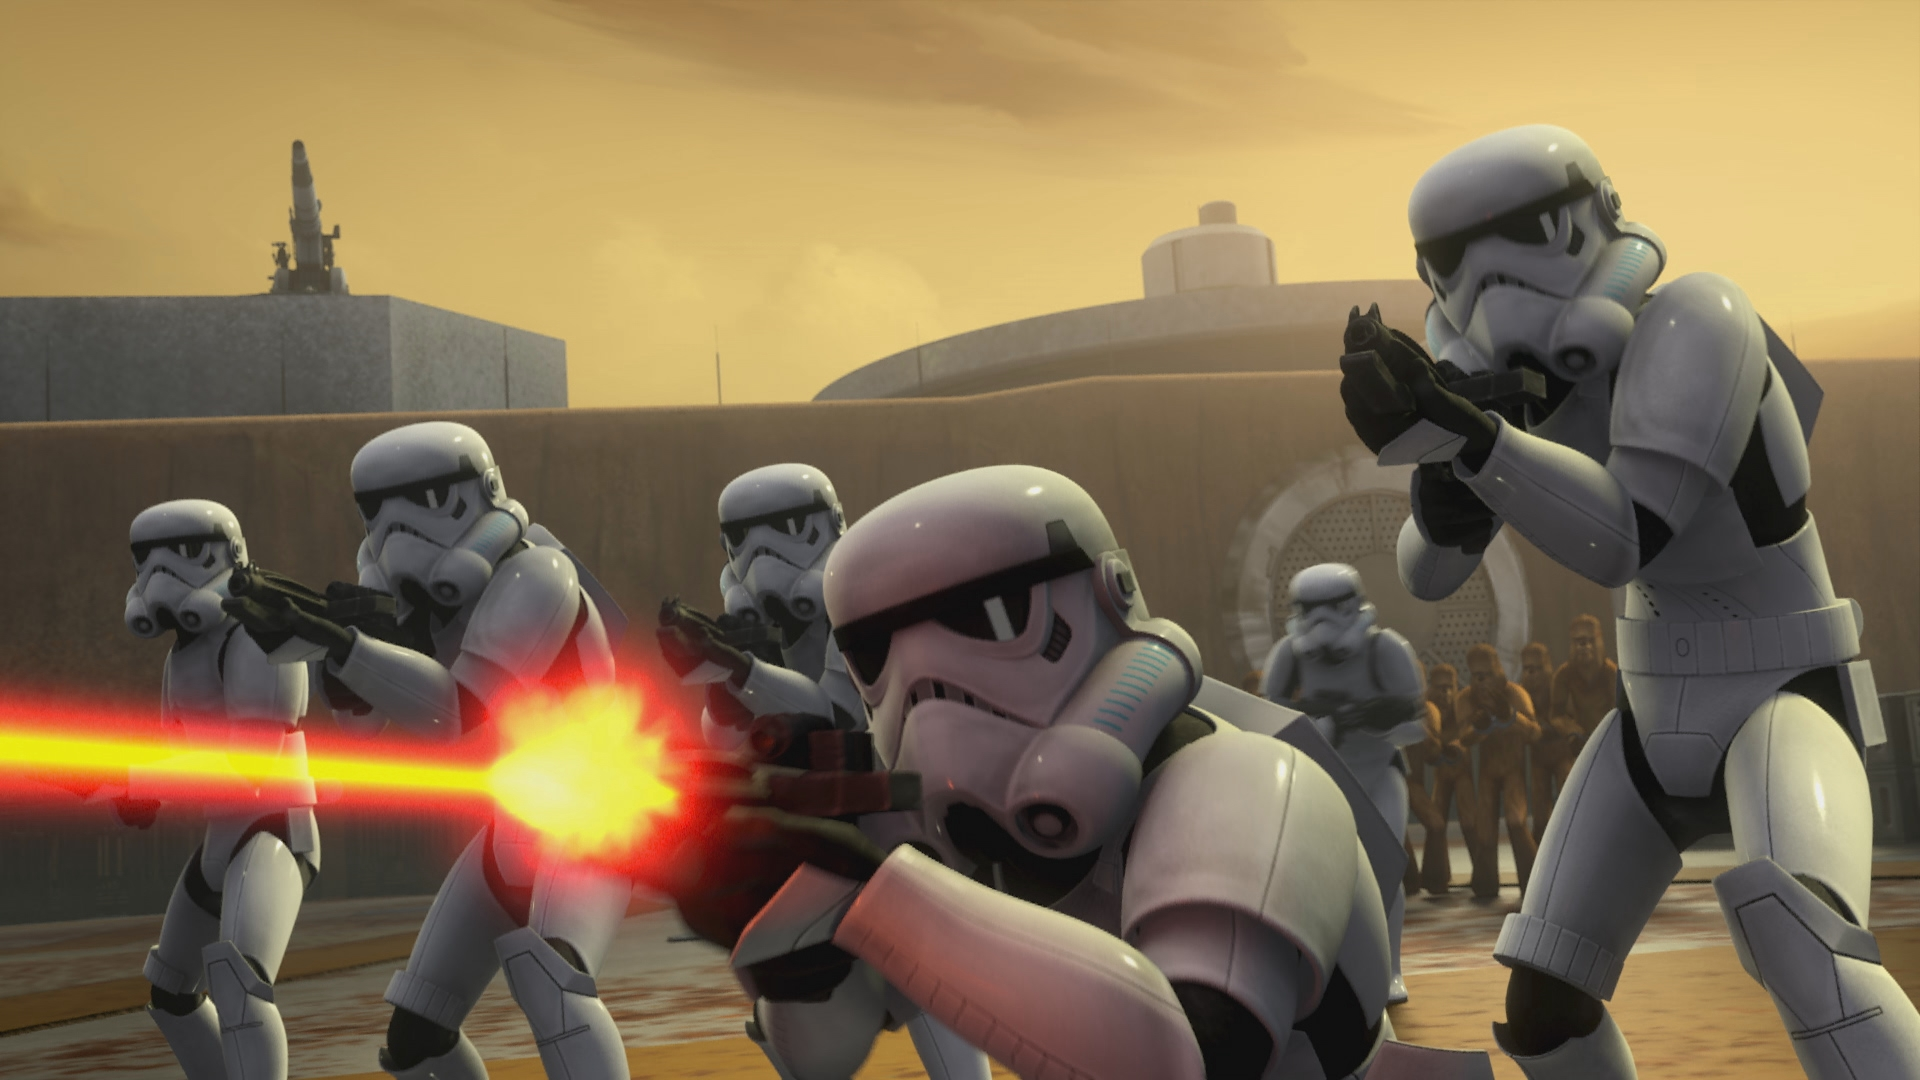 Star Wars Rebels Hd